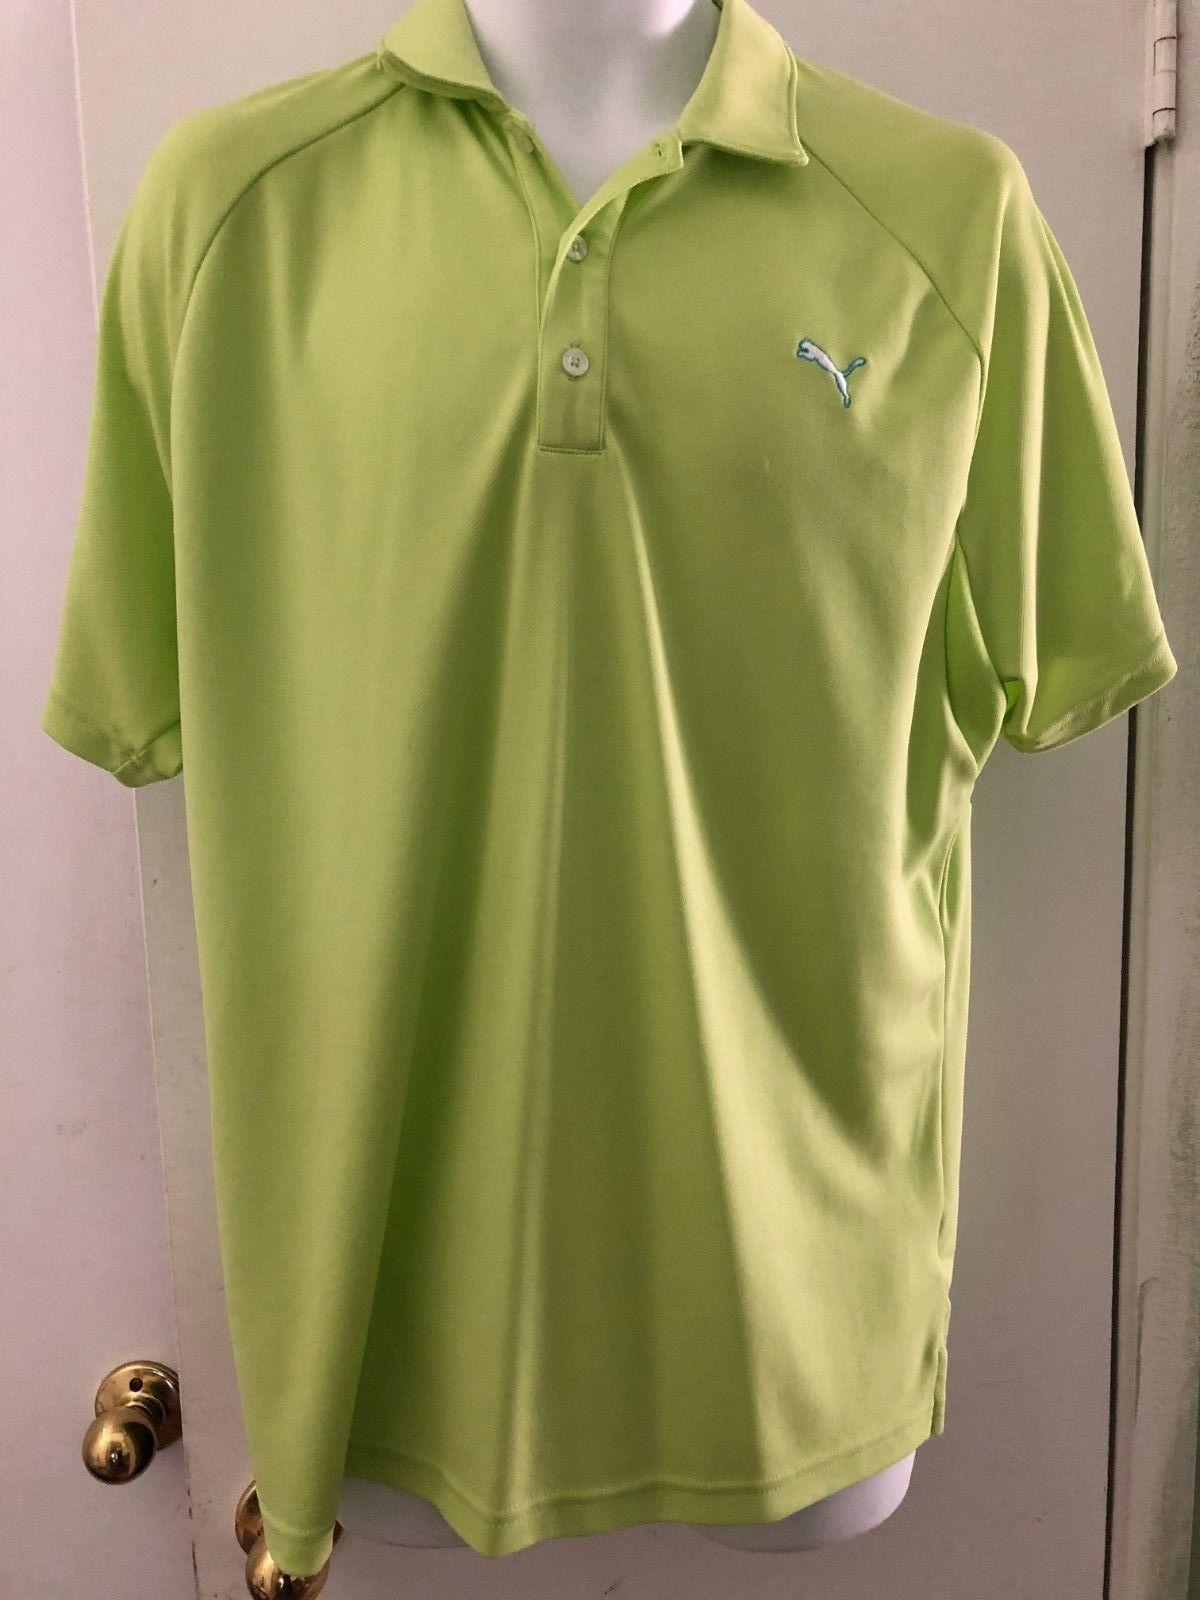 ec0f4da4c4cc Puma Golf Polo Grand Rickie Fowler Vert Bleu and 50 similar items. 57